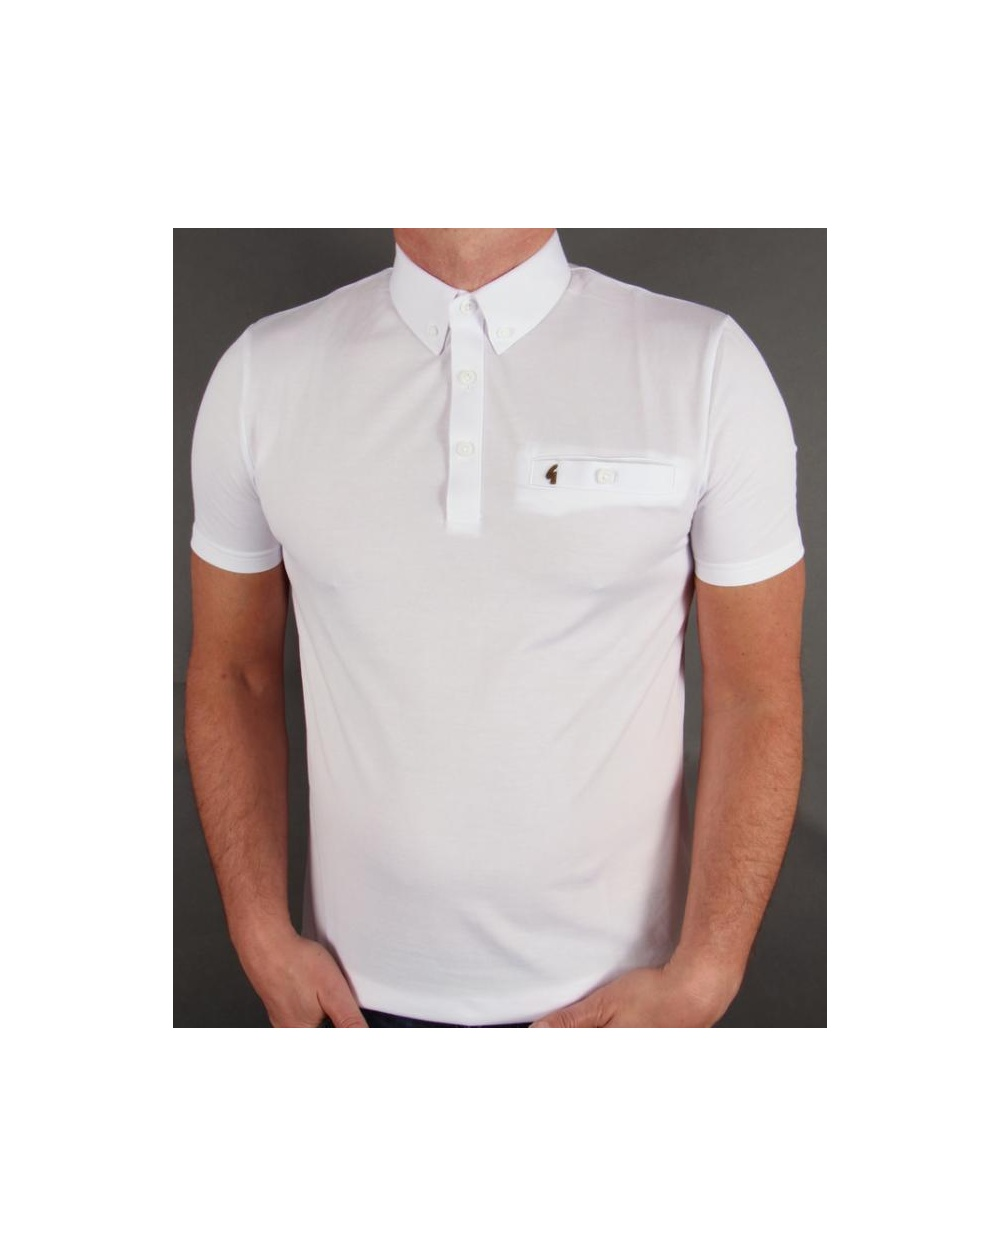 Gabicci Vintage Button Down Collar Polo Shirt White